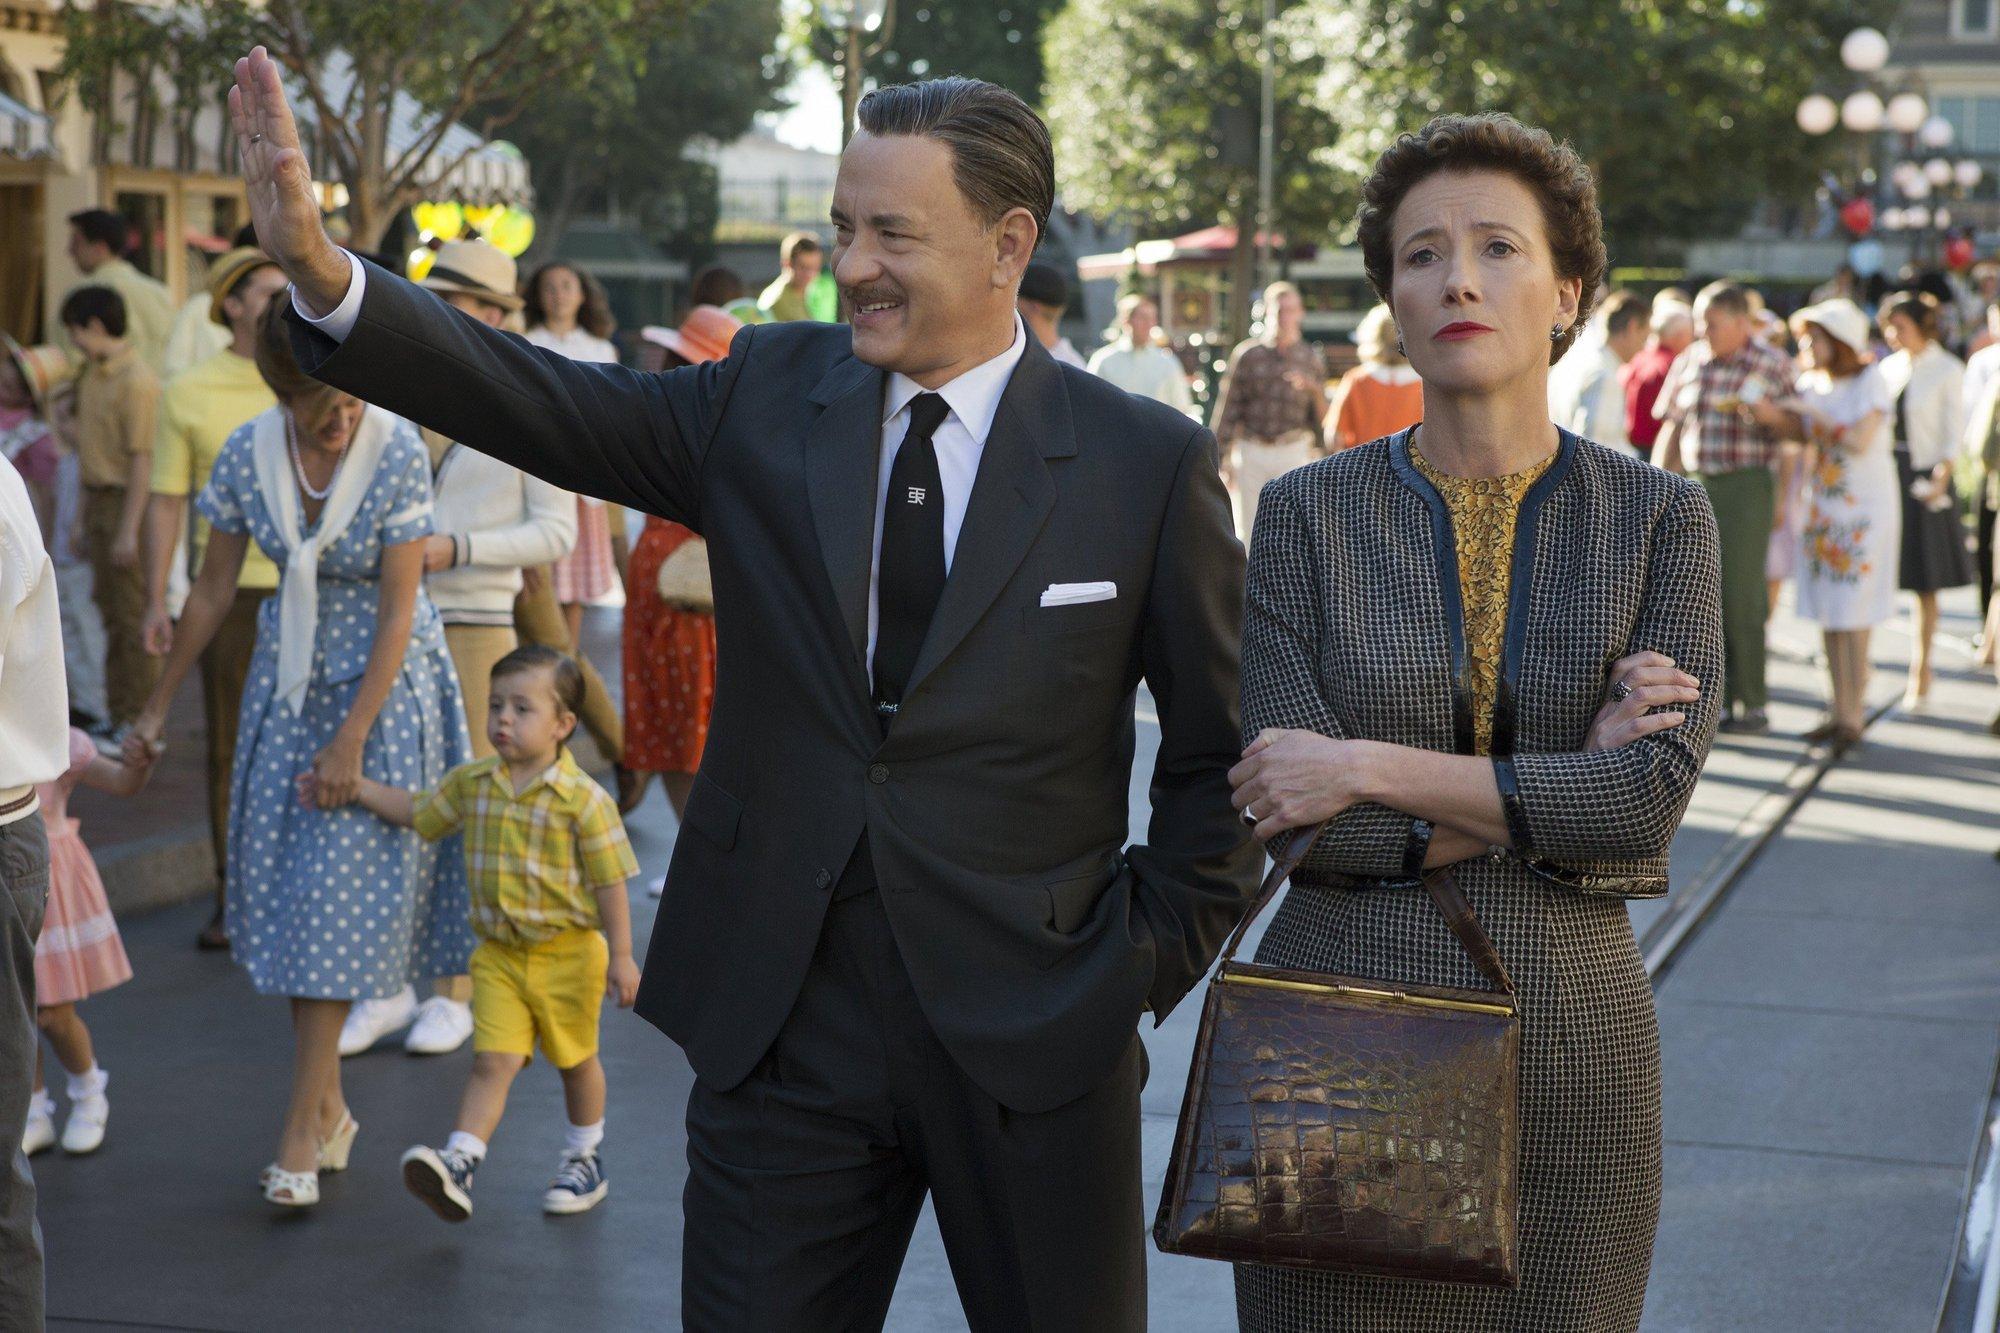 Walt Disney (Tom Hanks) shows Disneyland to 'Mary Poppins' author P.L. Travers (Emma Thompson) in 'Saving Mr. Banks.'